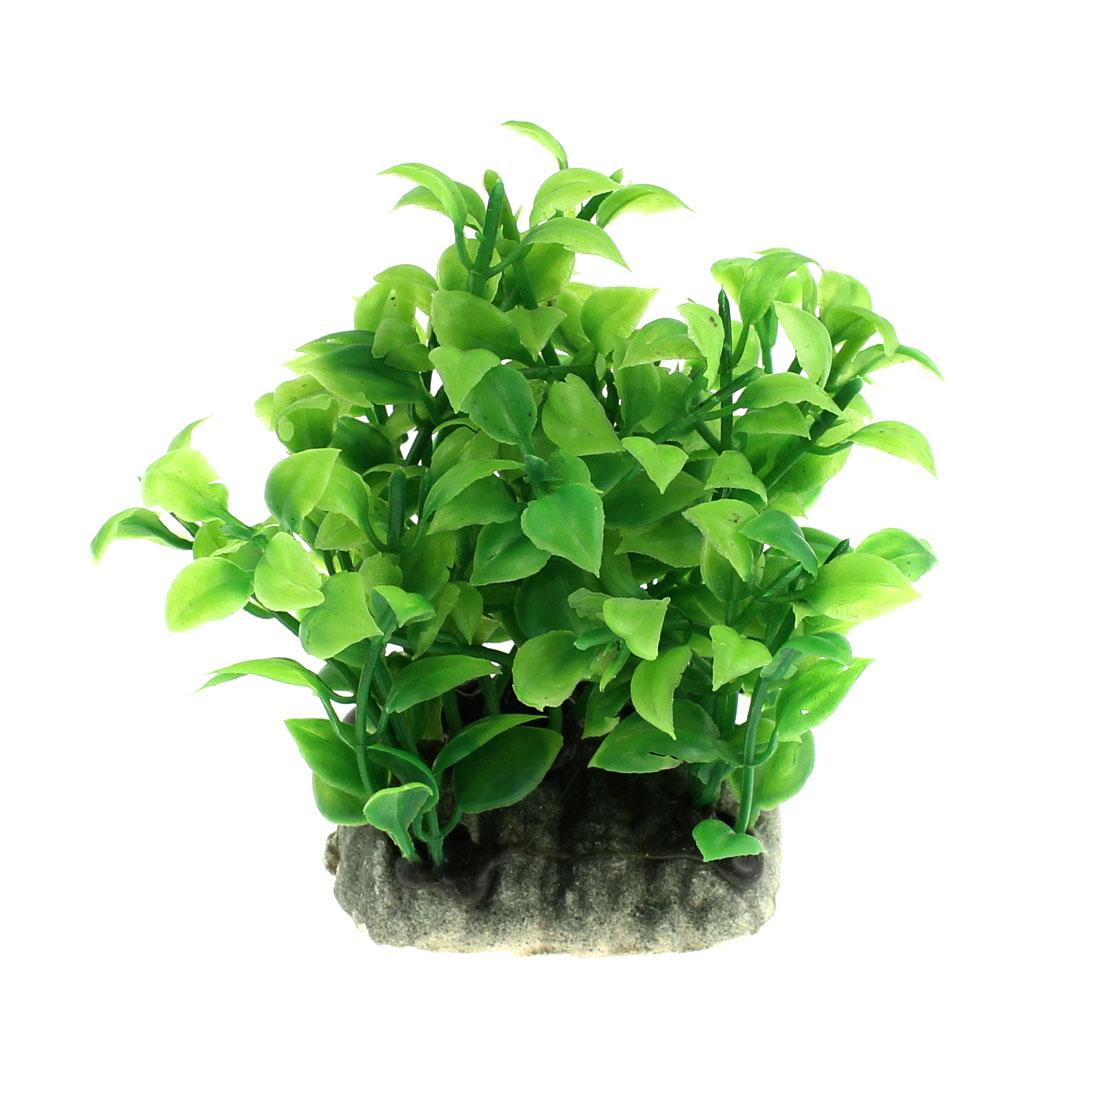 Aquarium Plastic Emulational Water Grass Plant Ornament Green 8cm Height